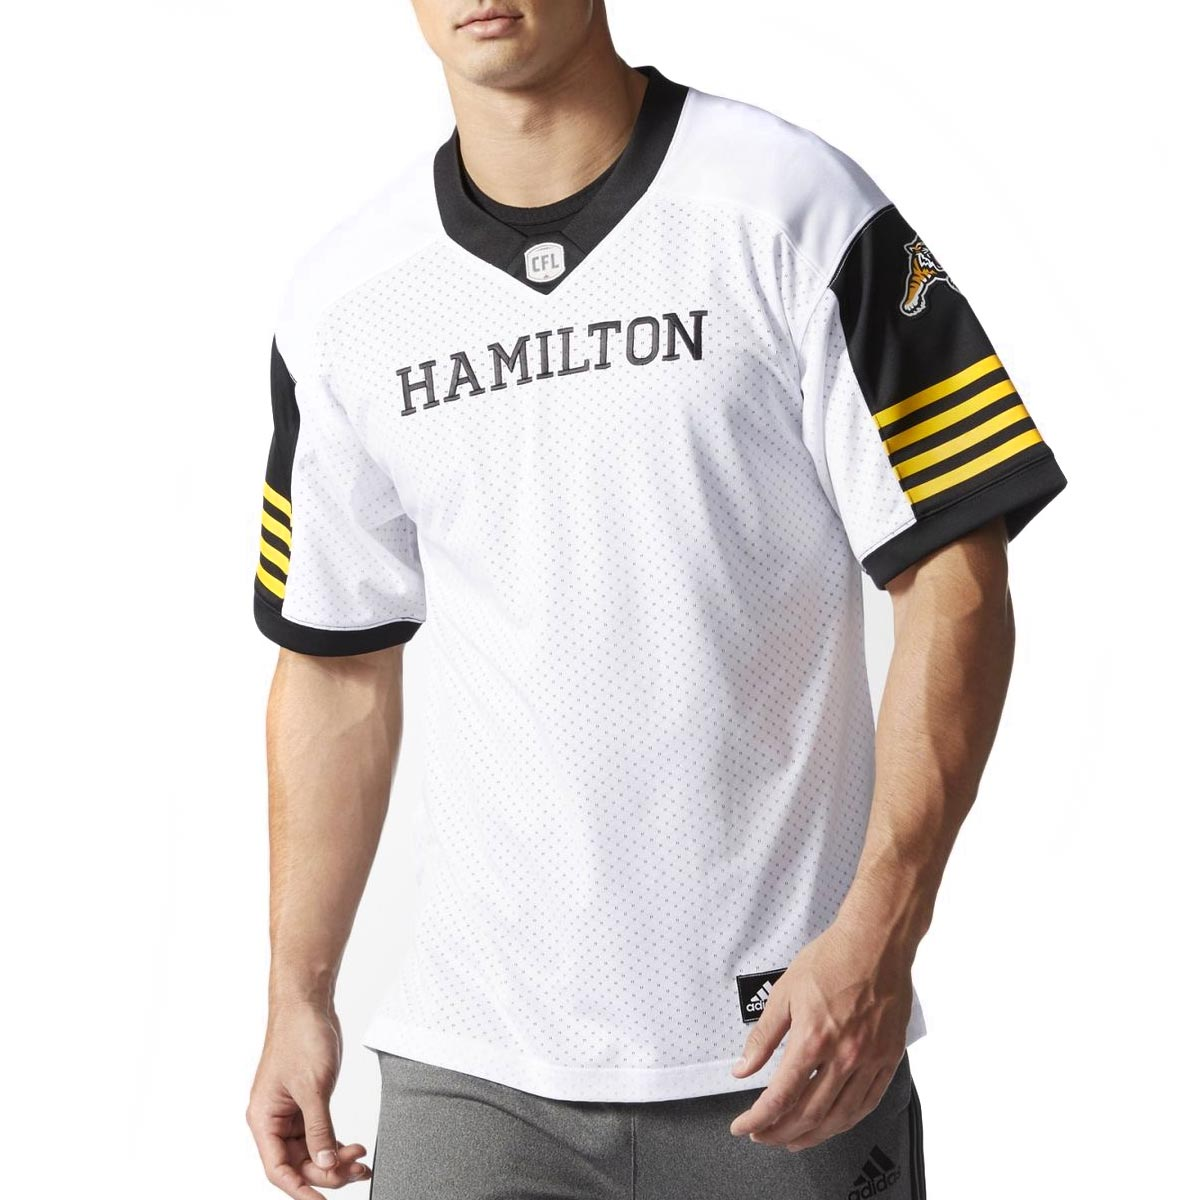 8cd9009c89e Sports Jerseys for Sale in Canada | Walmart Canada